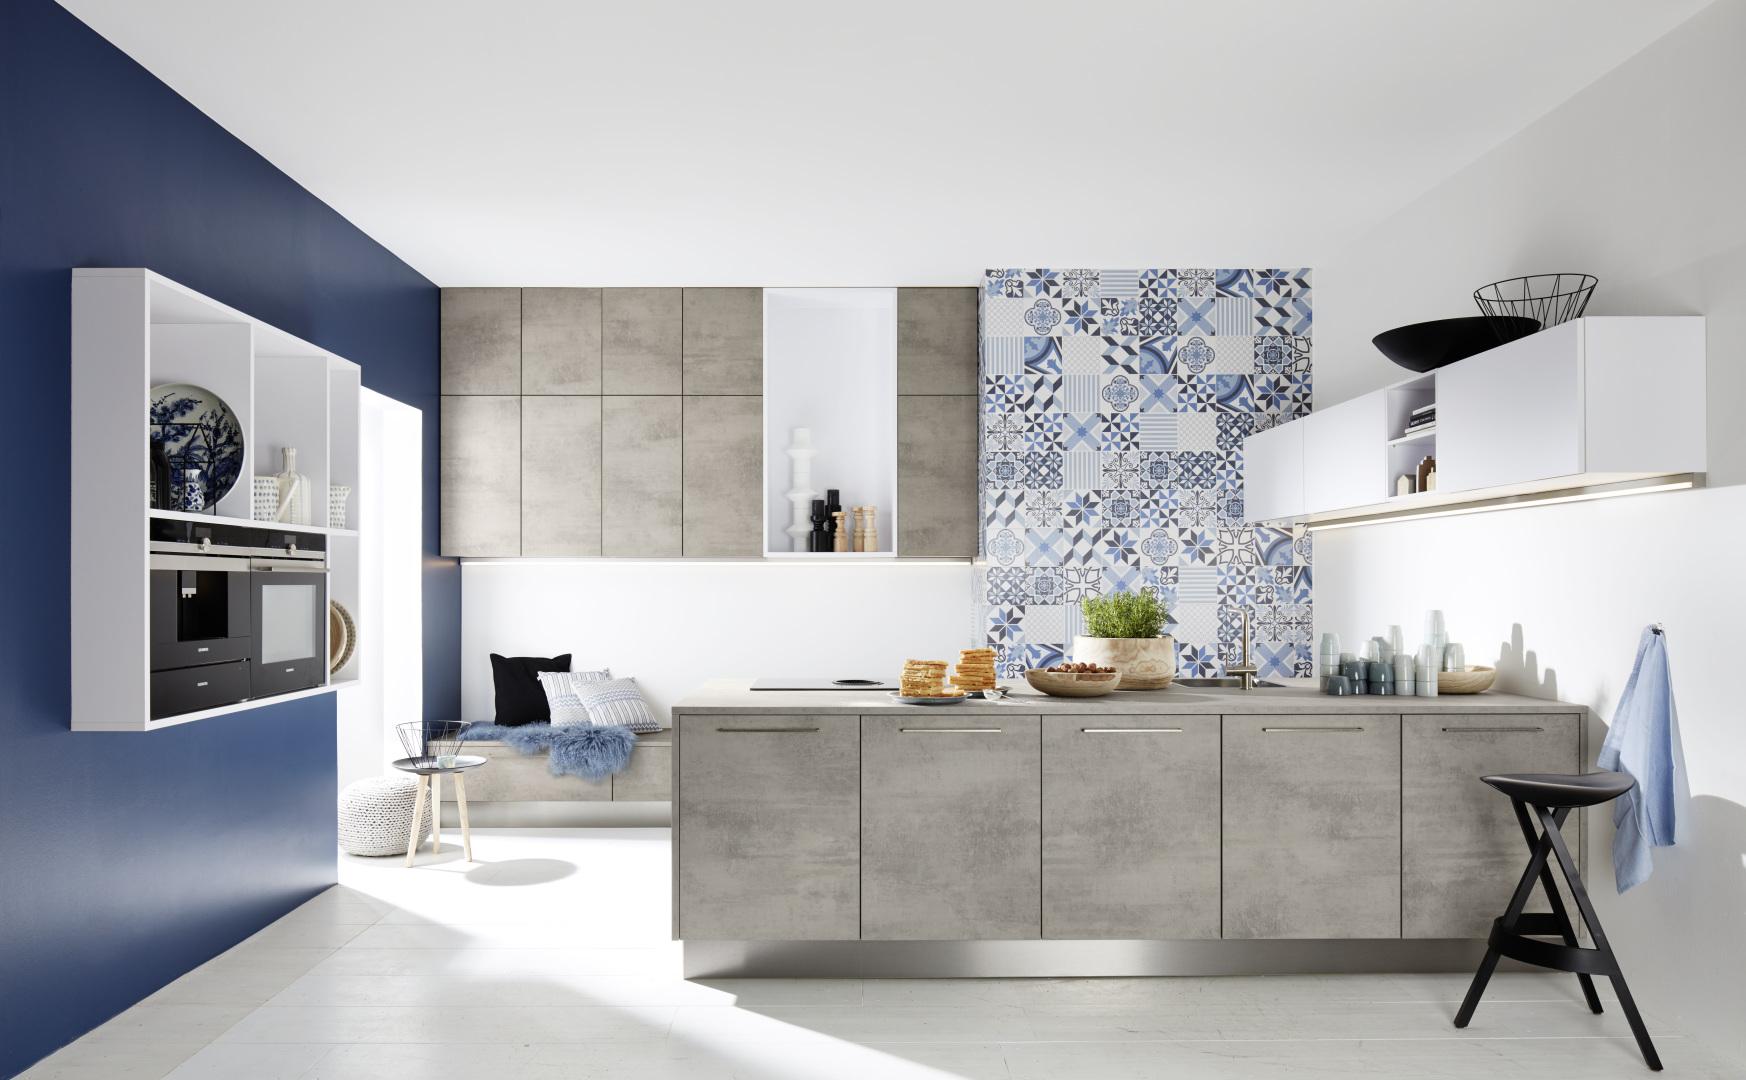 kuchnia z betonowymi elementami